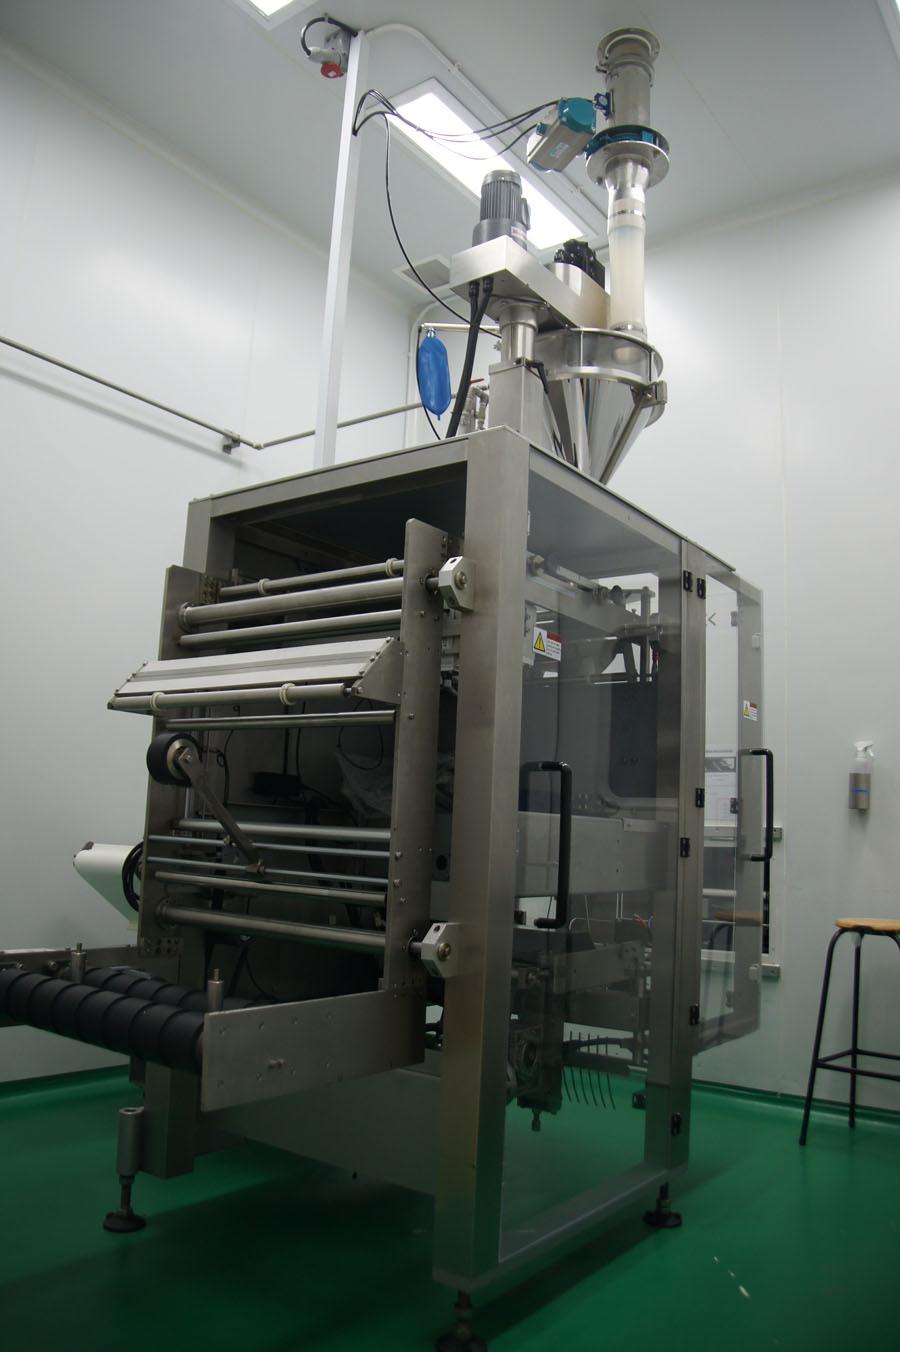 Image of 100–1,000g VFFS equipment